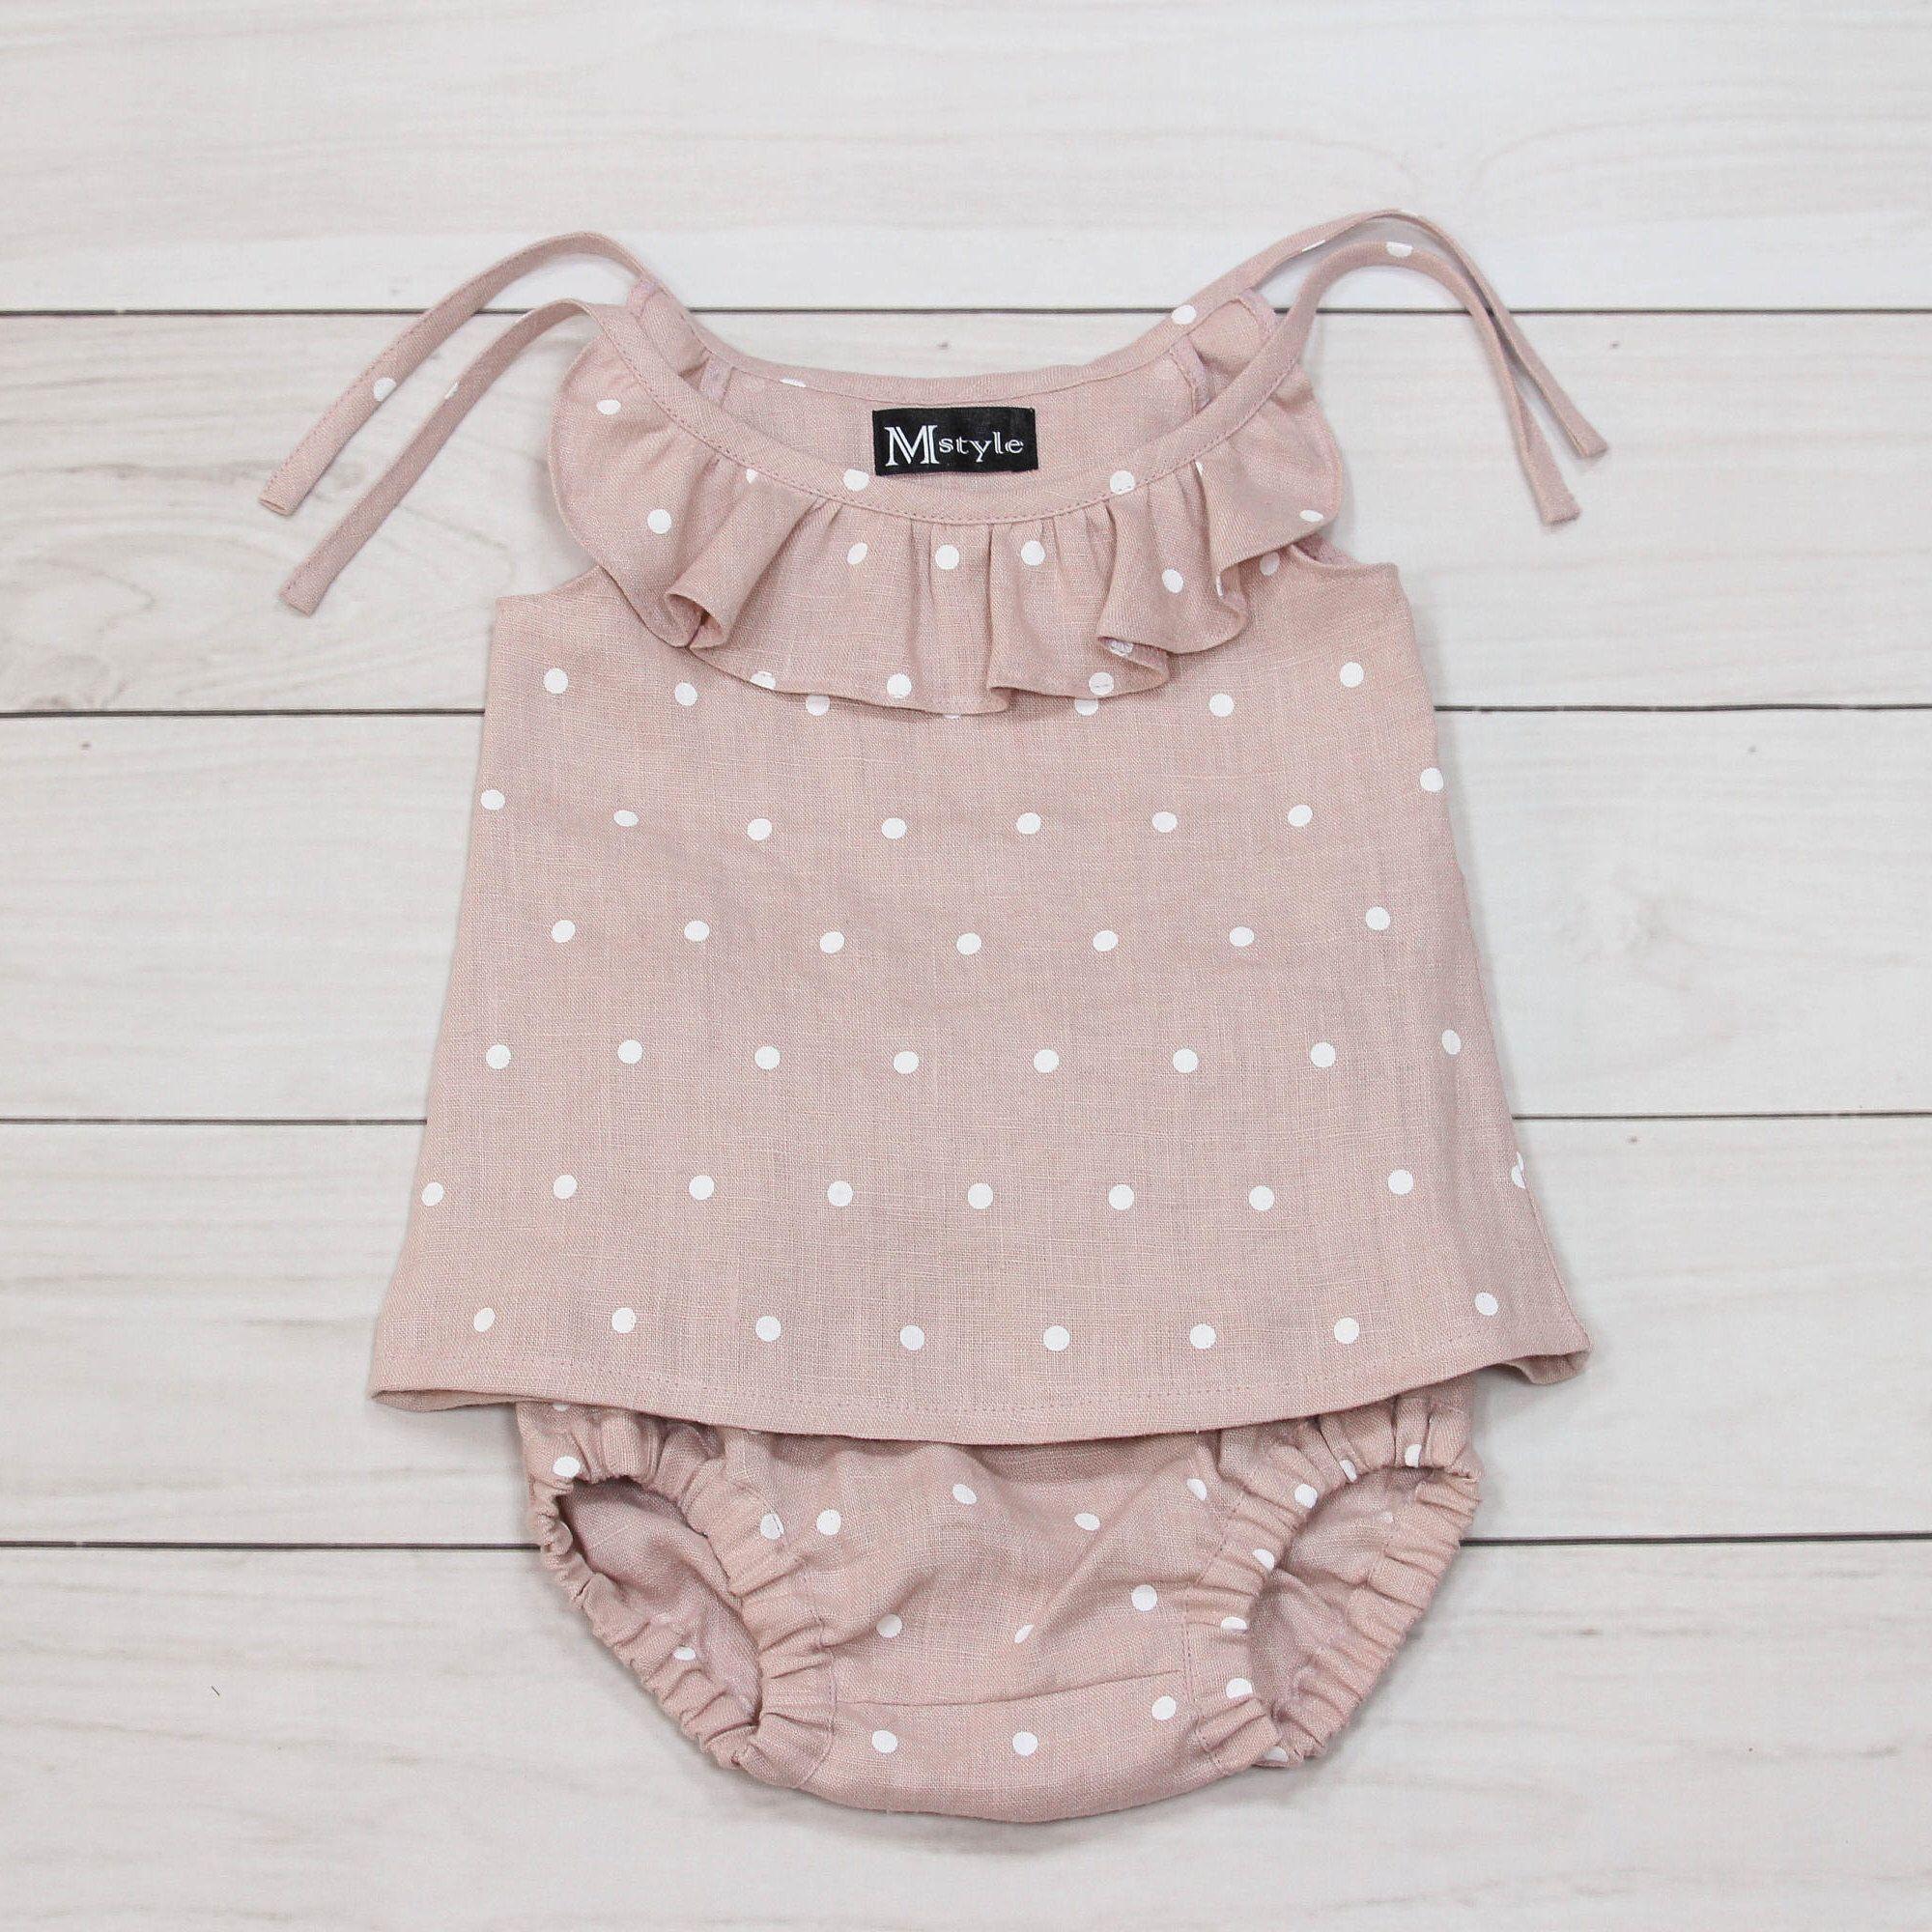 bloomer set pink bloomer set girls bloomers newborn outfit baby